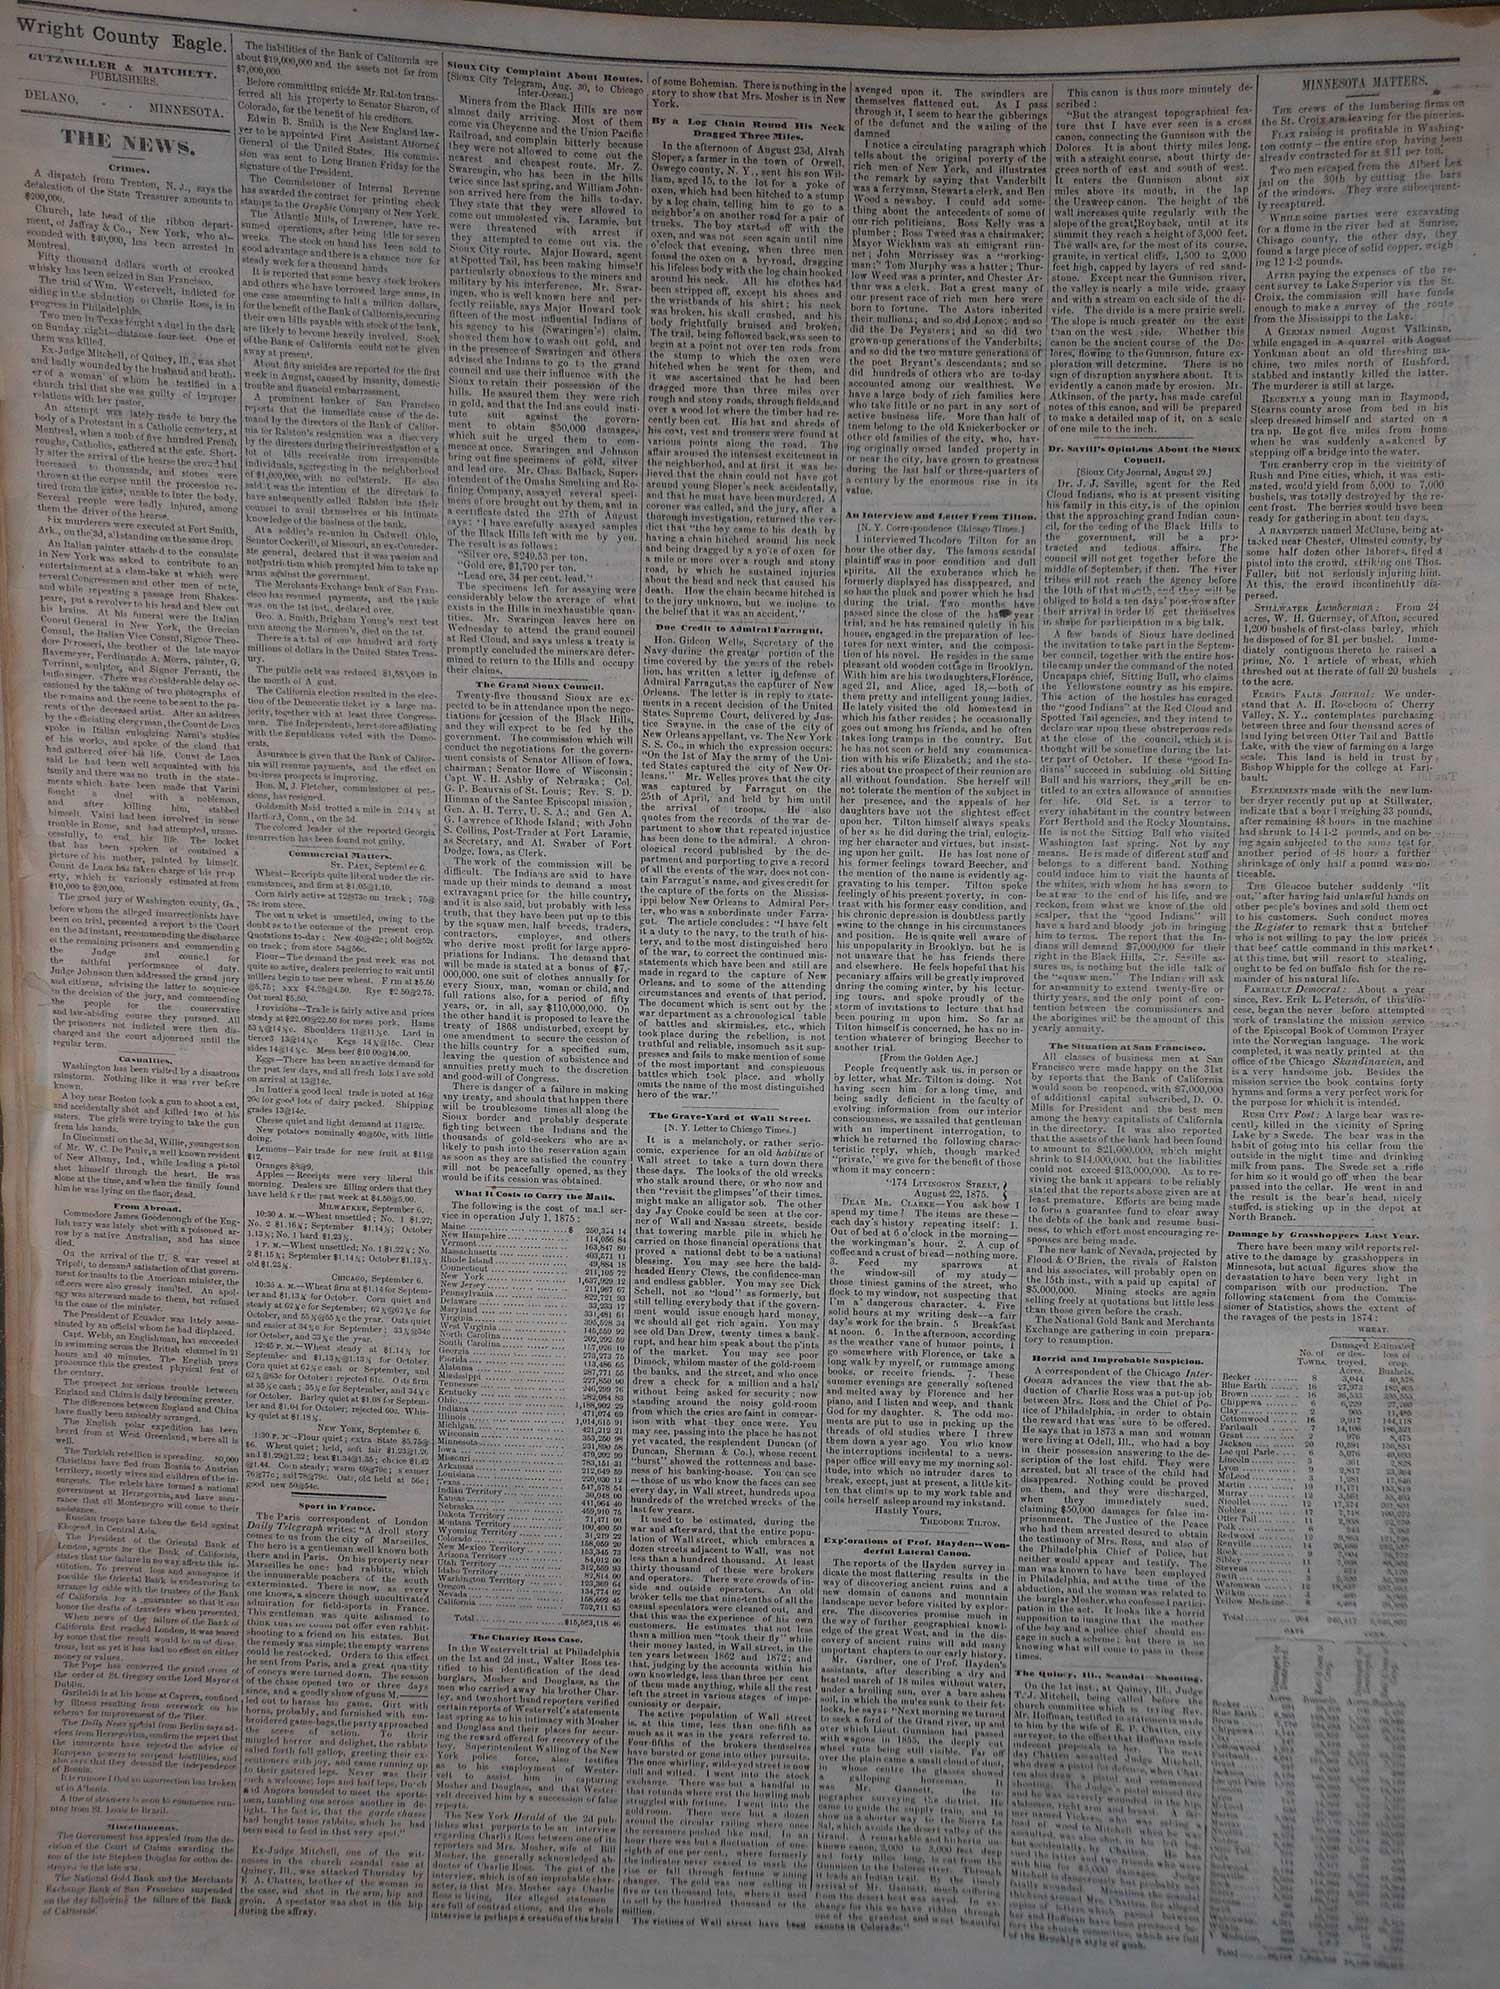 9/8/1875, p2